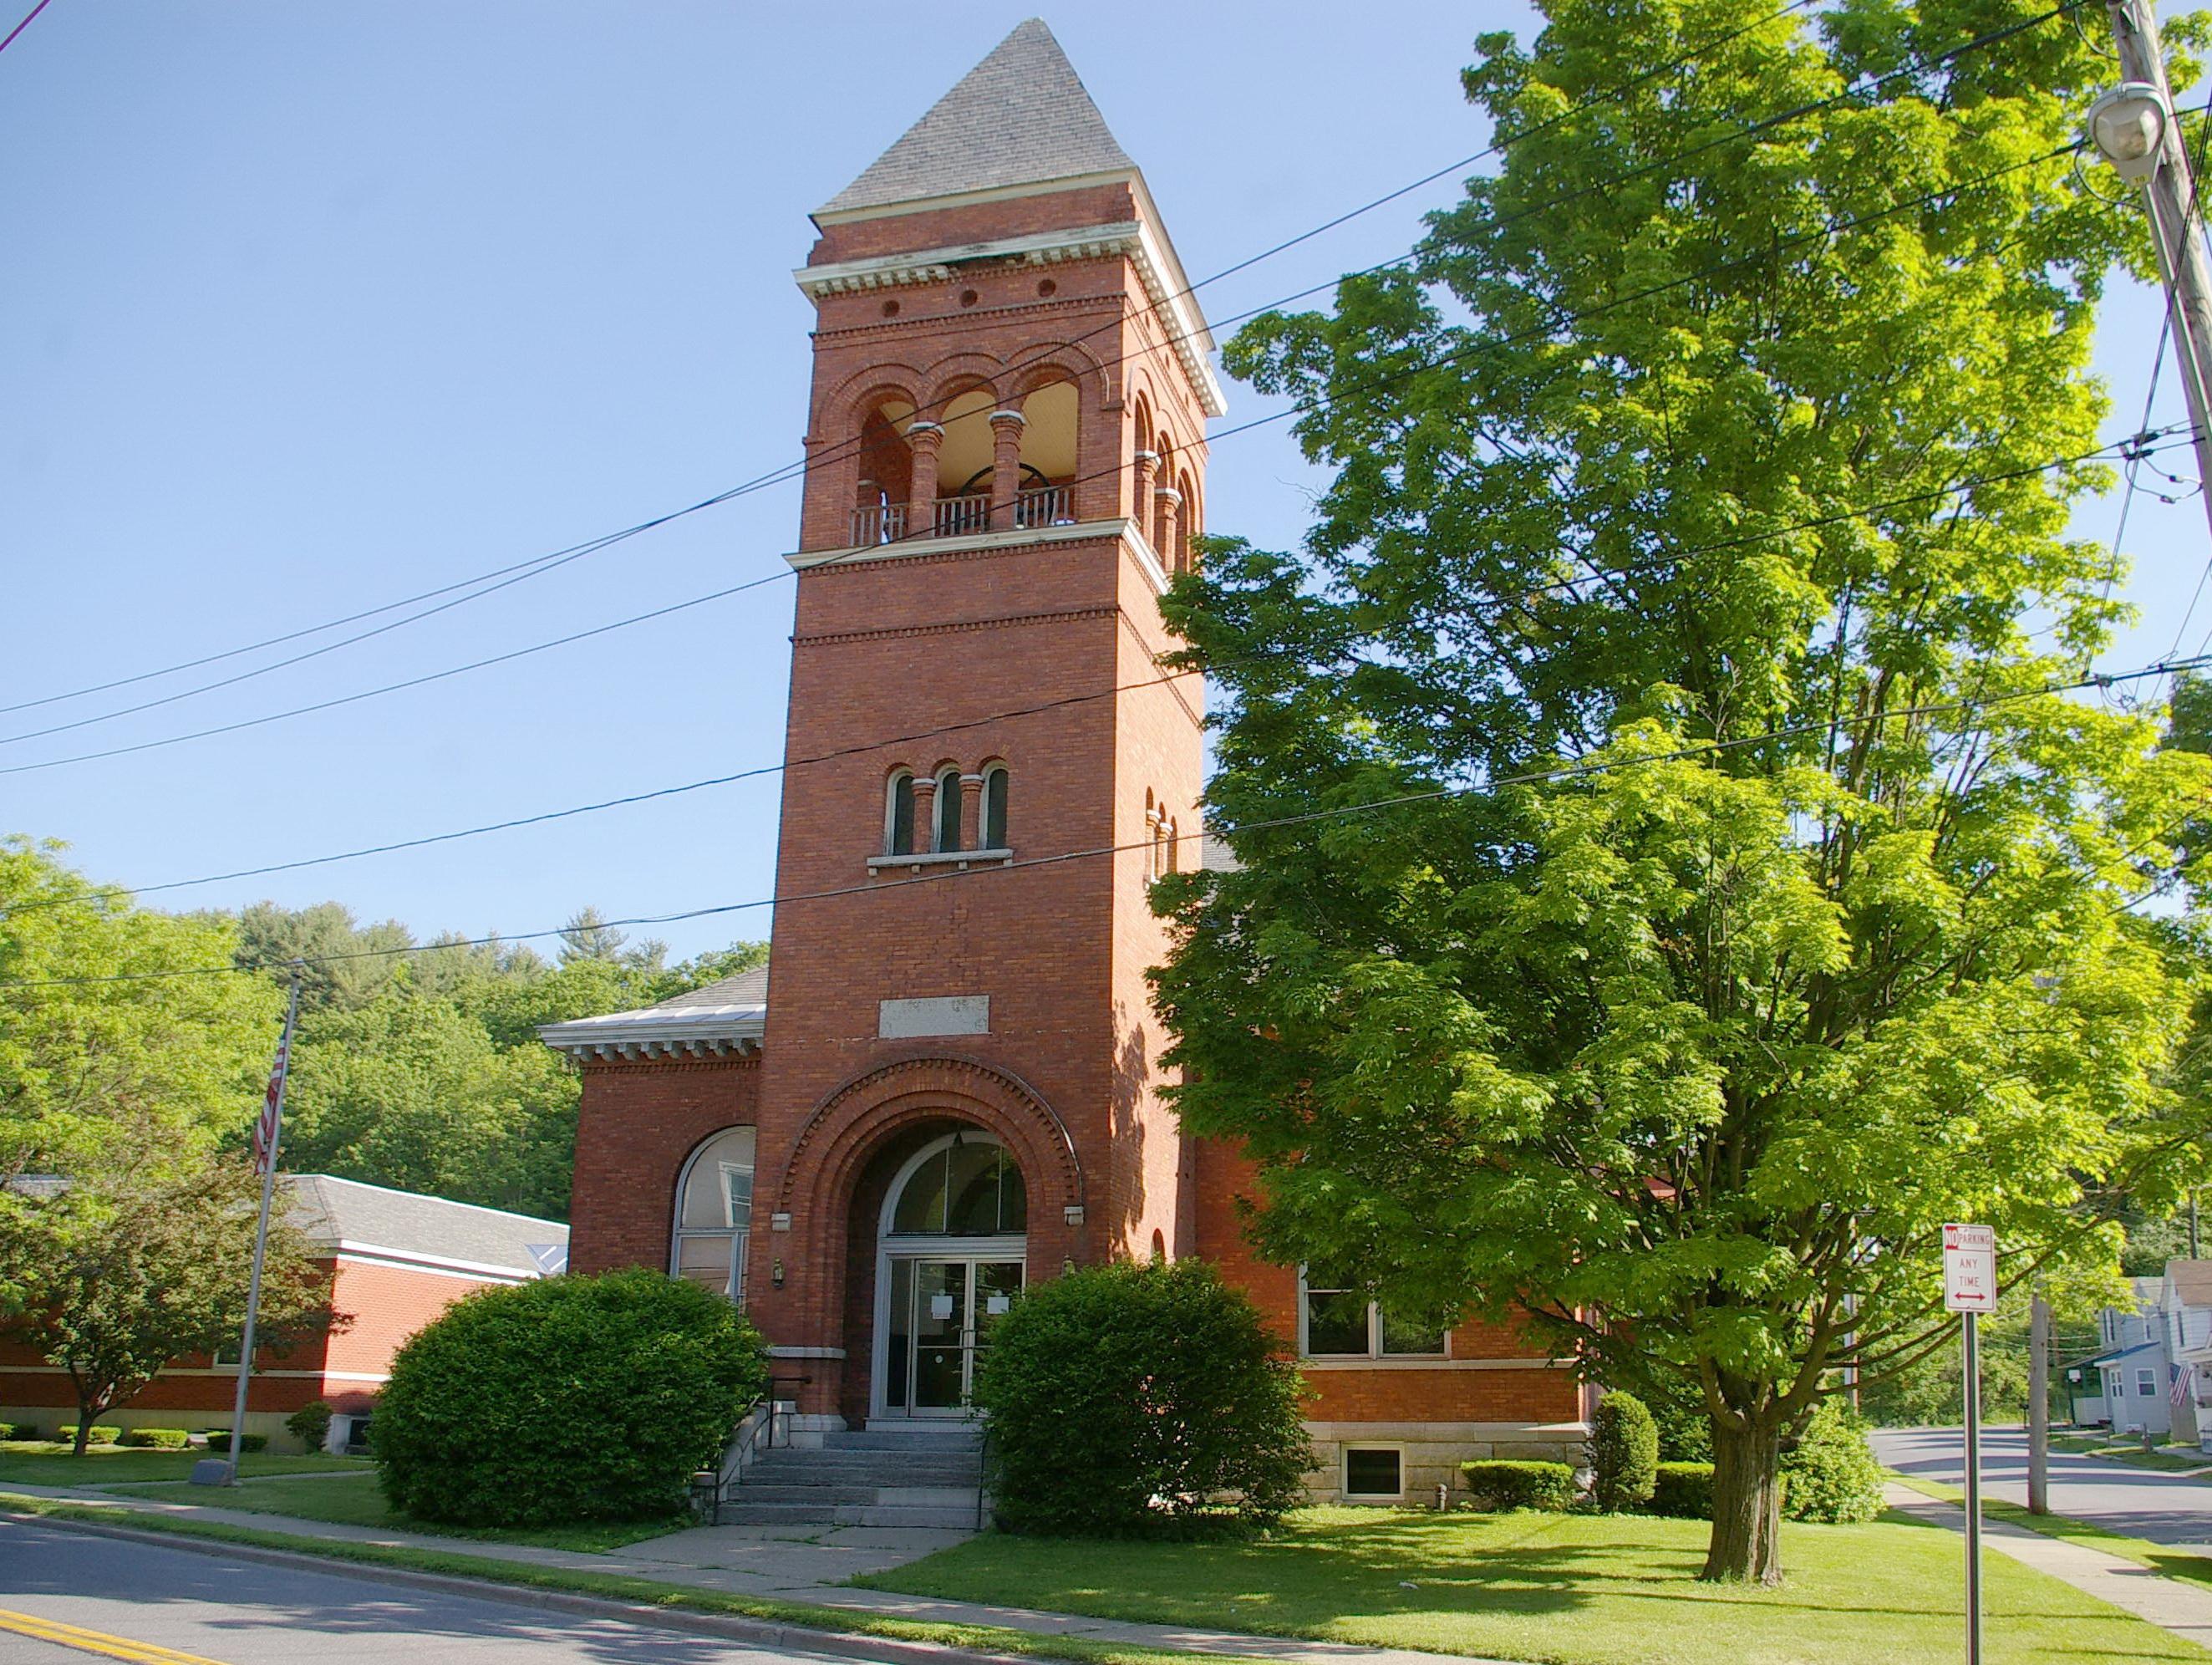 New york montgomery county fonda - County Courthouse Fonda